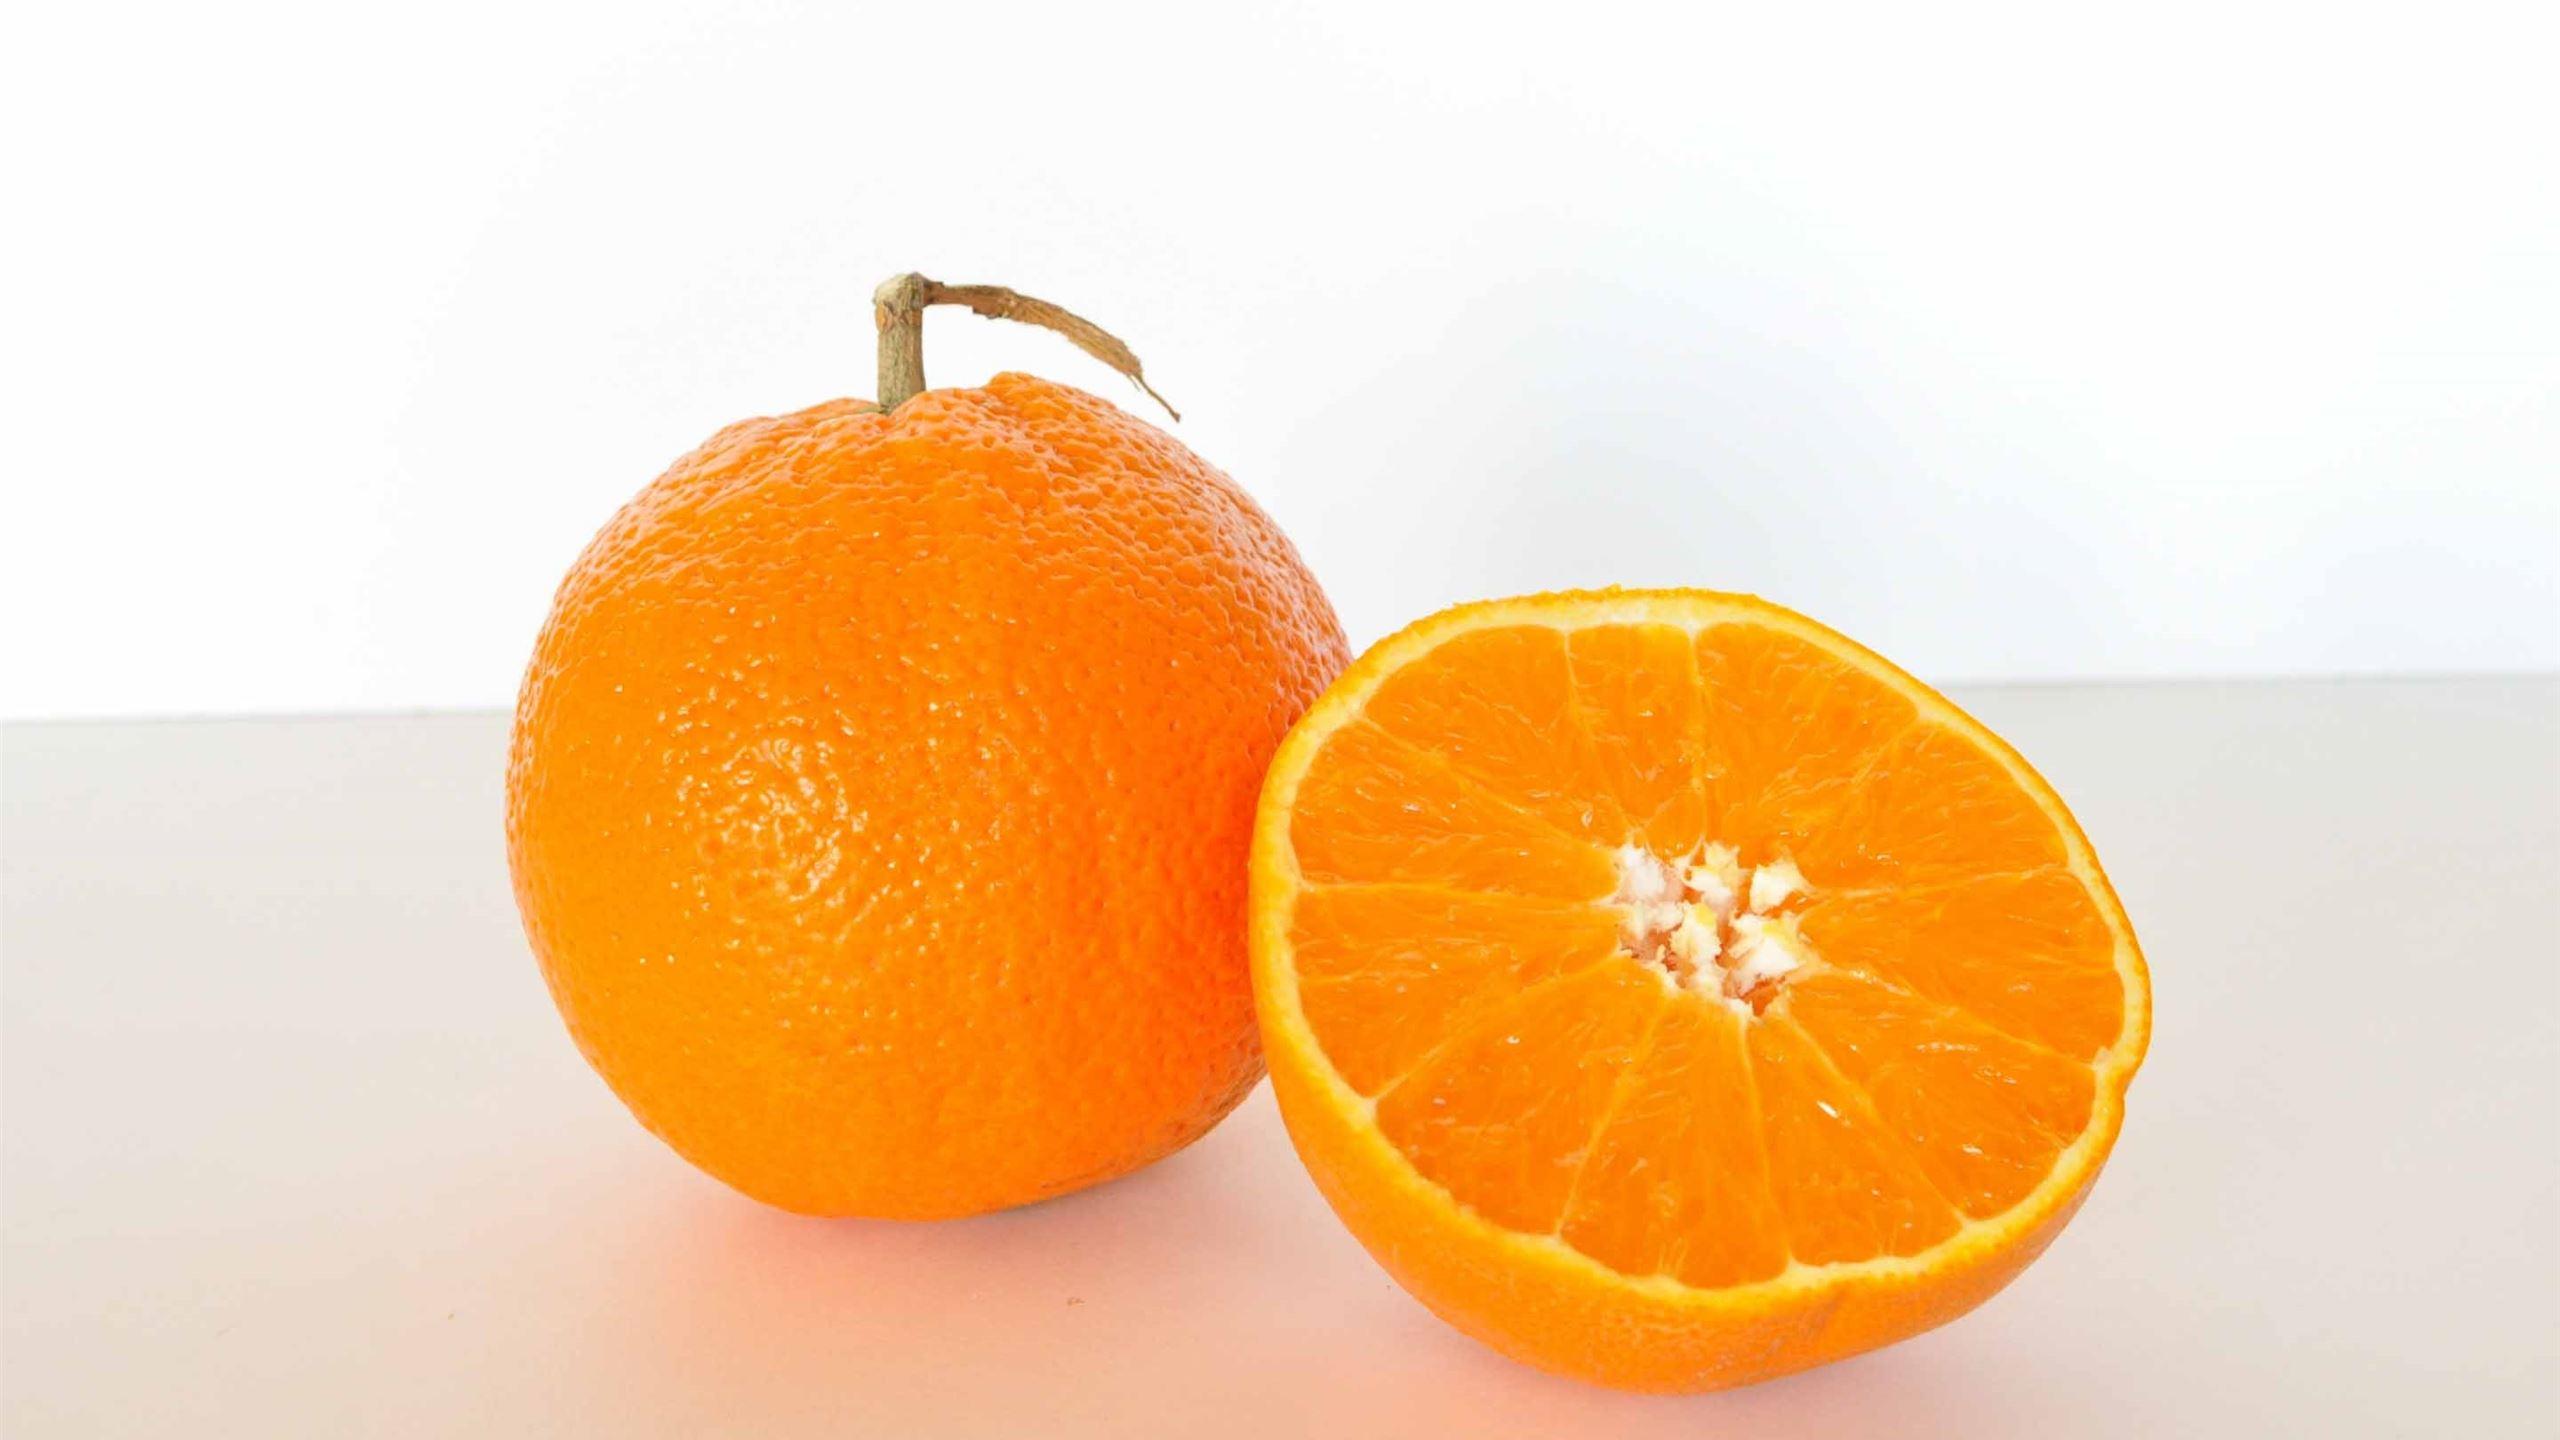 orange fruit mac wallpaper download allmacwallpaper